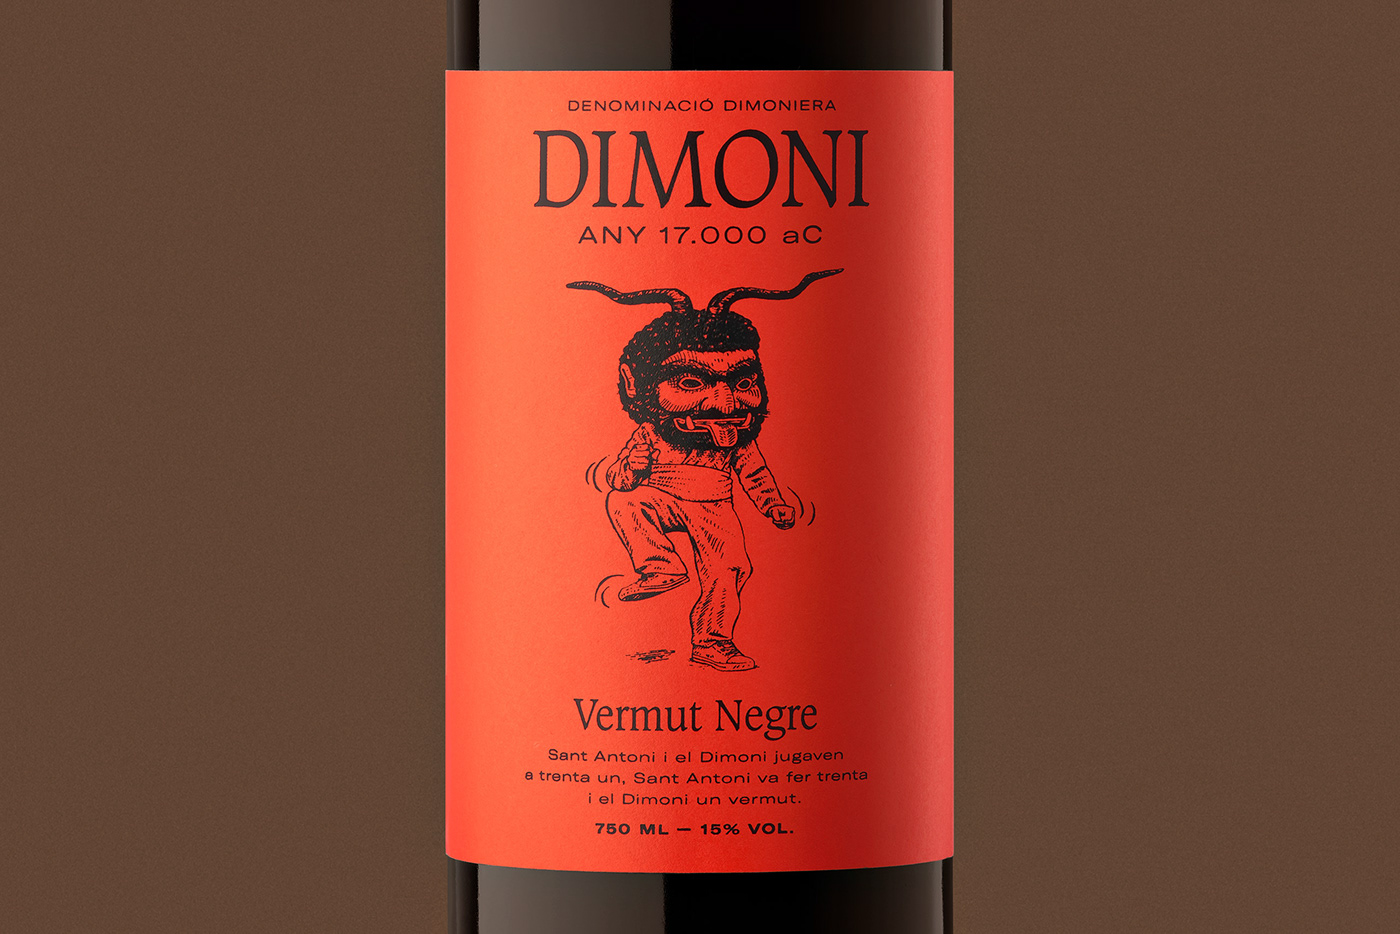 Pack vermut mallorca barcelona bottle red devil stamp totebag